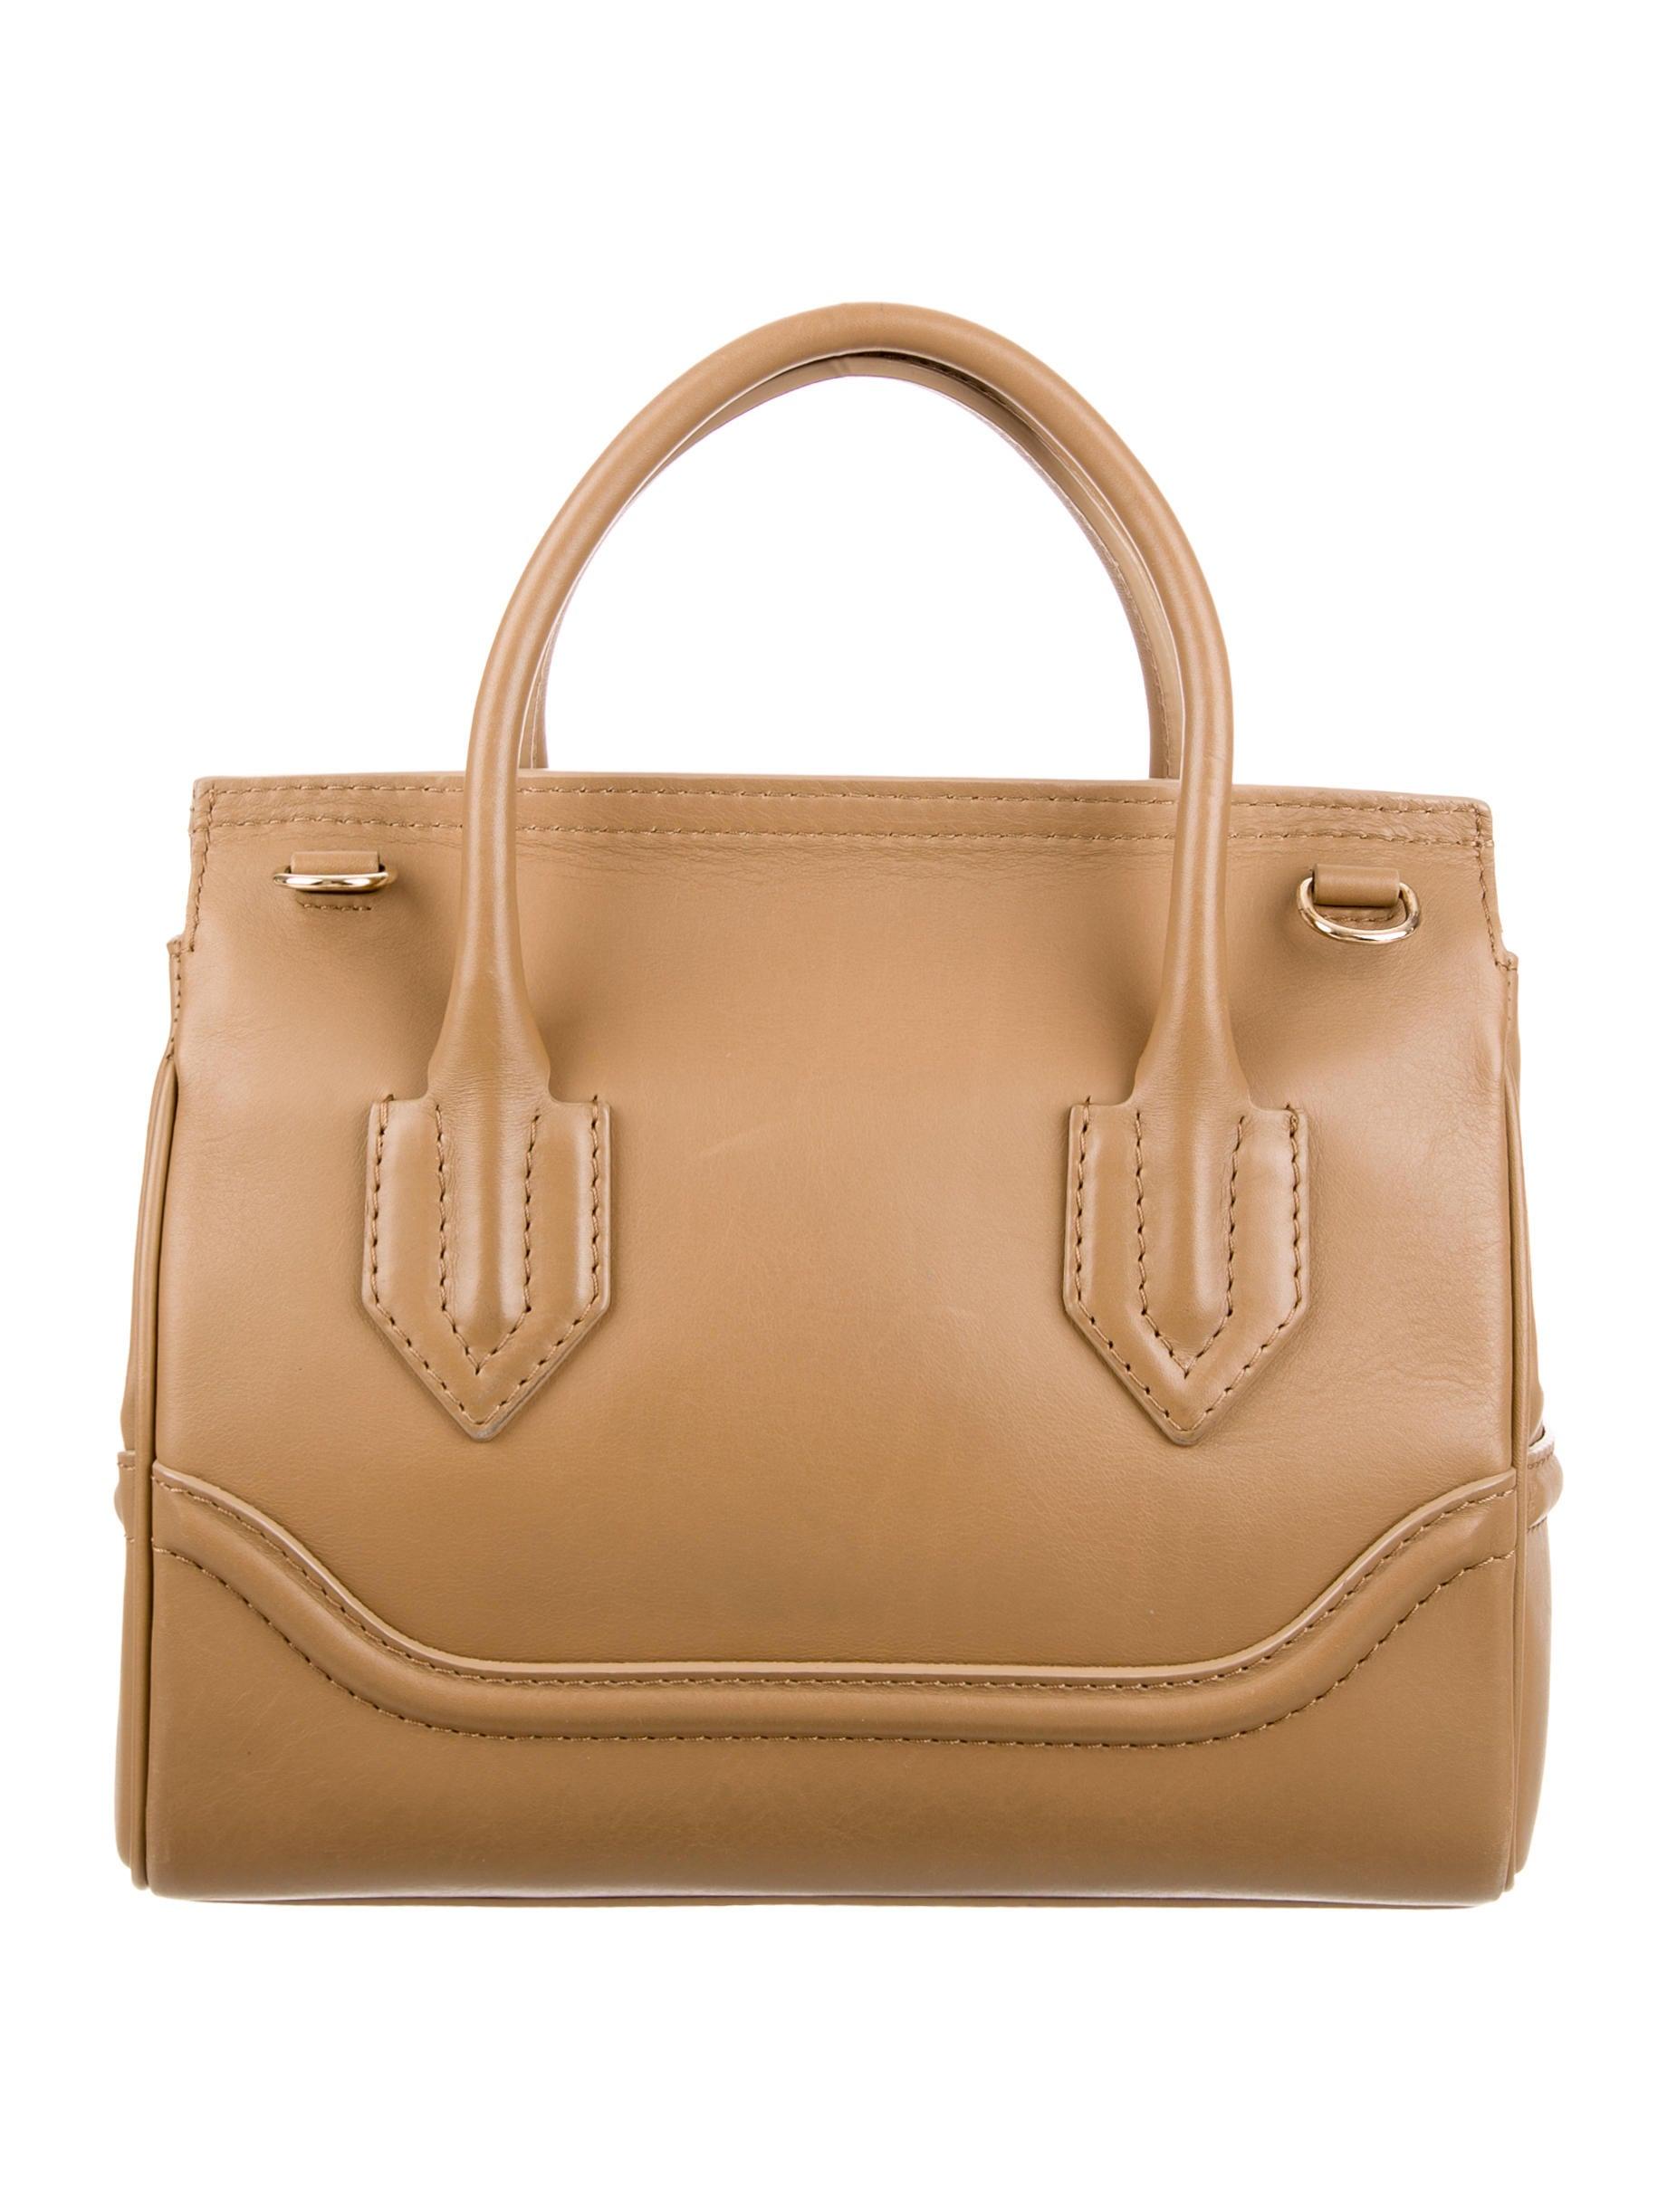 Versace Medium Palazzo Empire Bag Handbags VES29680  : VES296804enlarged from www.therealreal.com size 1852 x 2443 jpeg 254kB